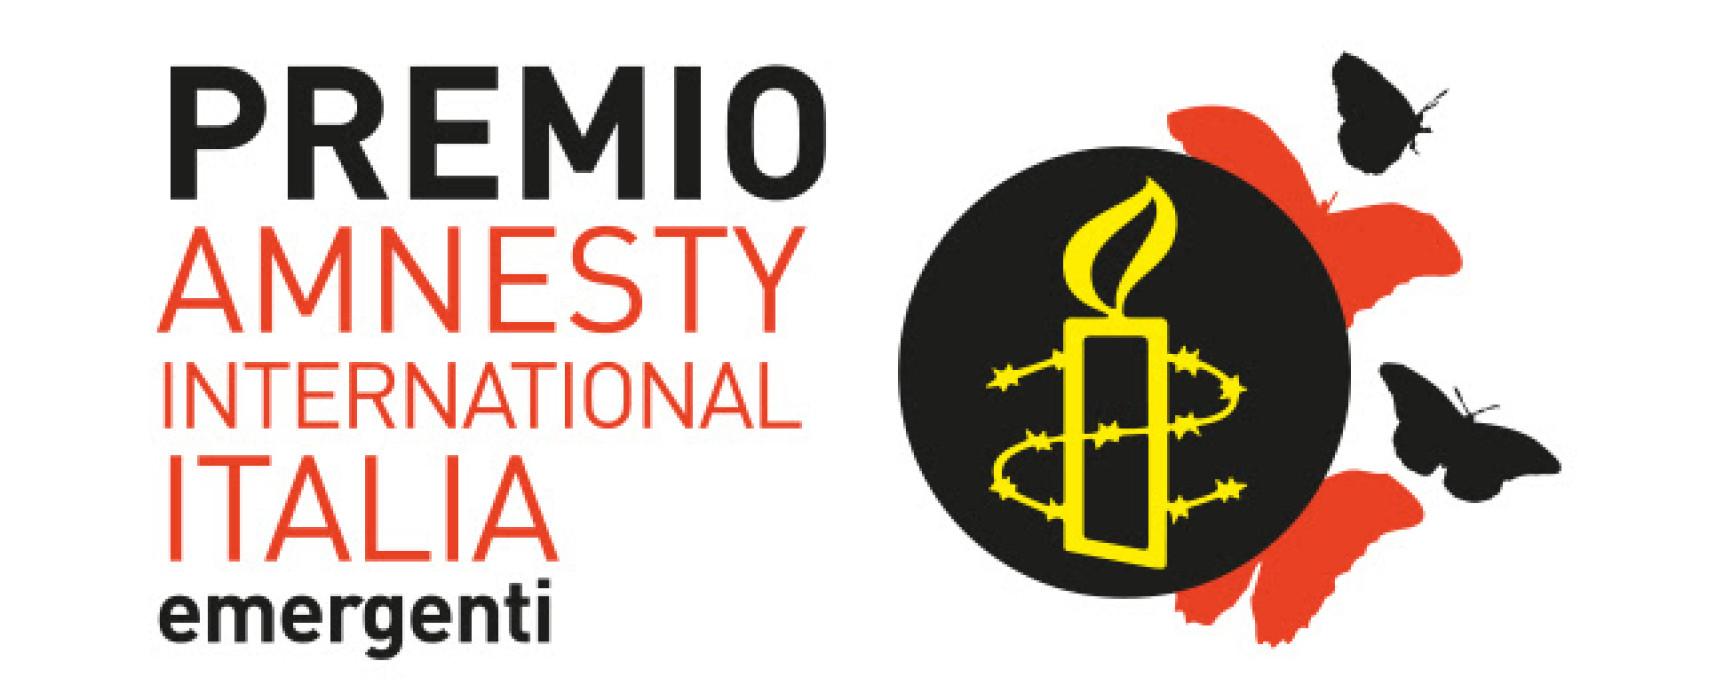 Premio Amnesty International Italia Emergenti – Voci per la Libertà